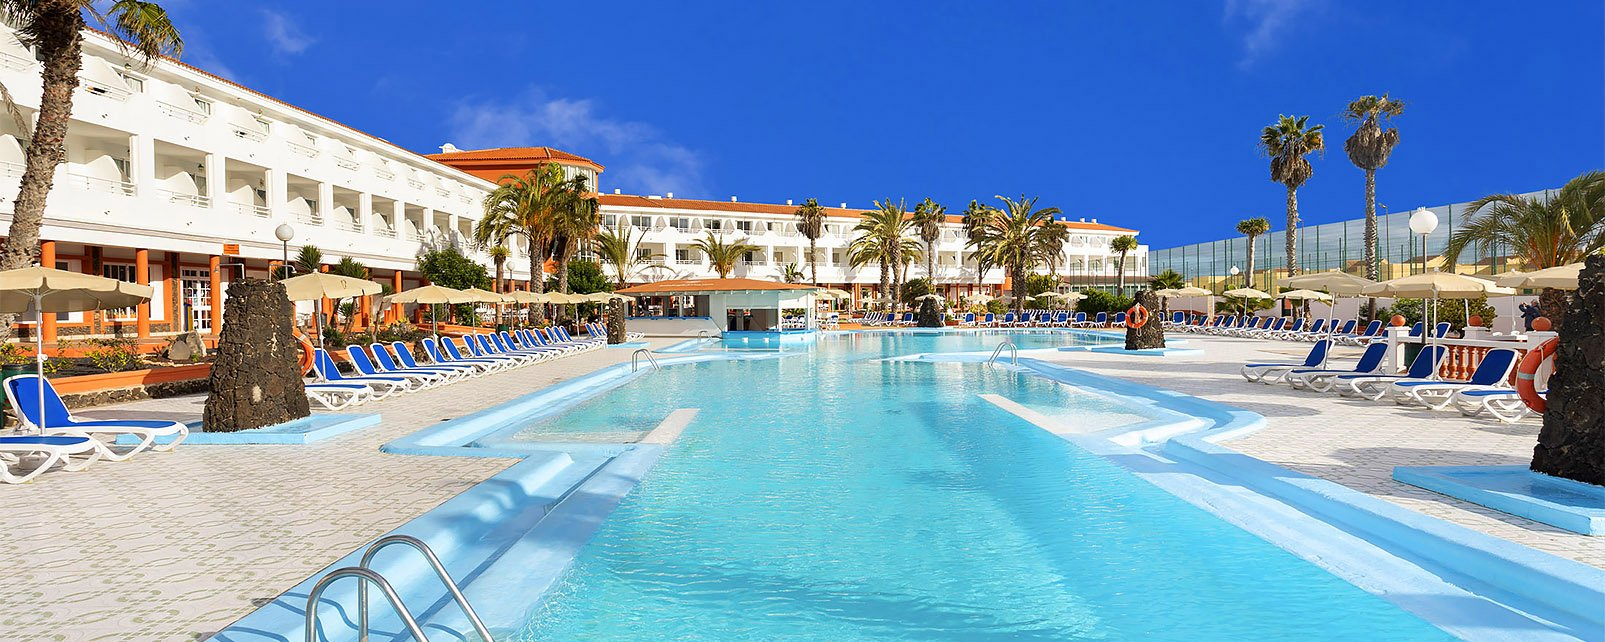 Hotel Costa Tropical